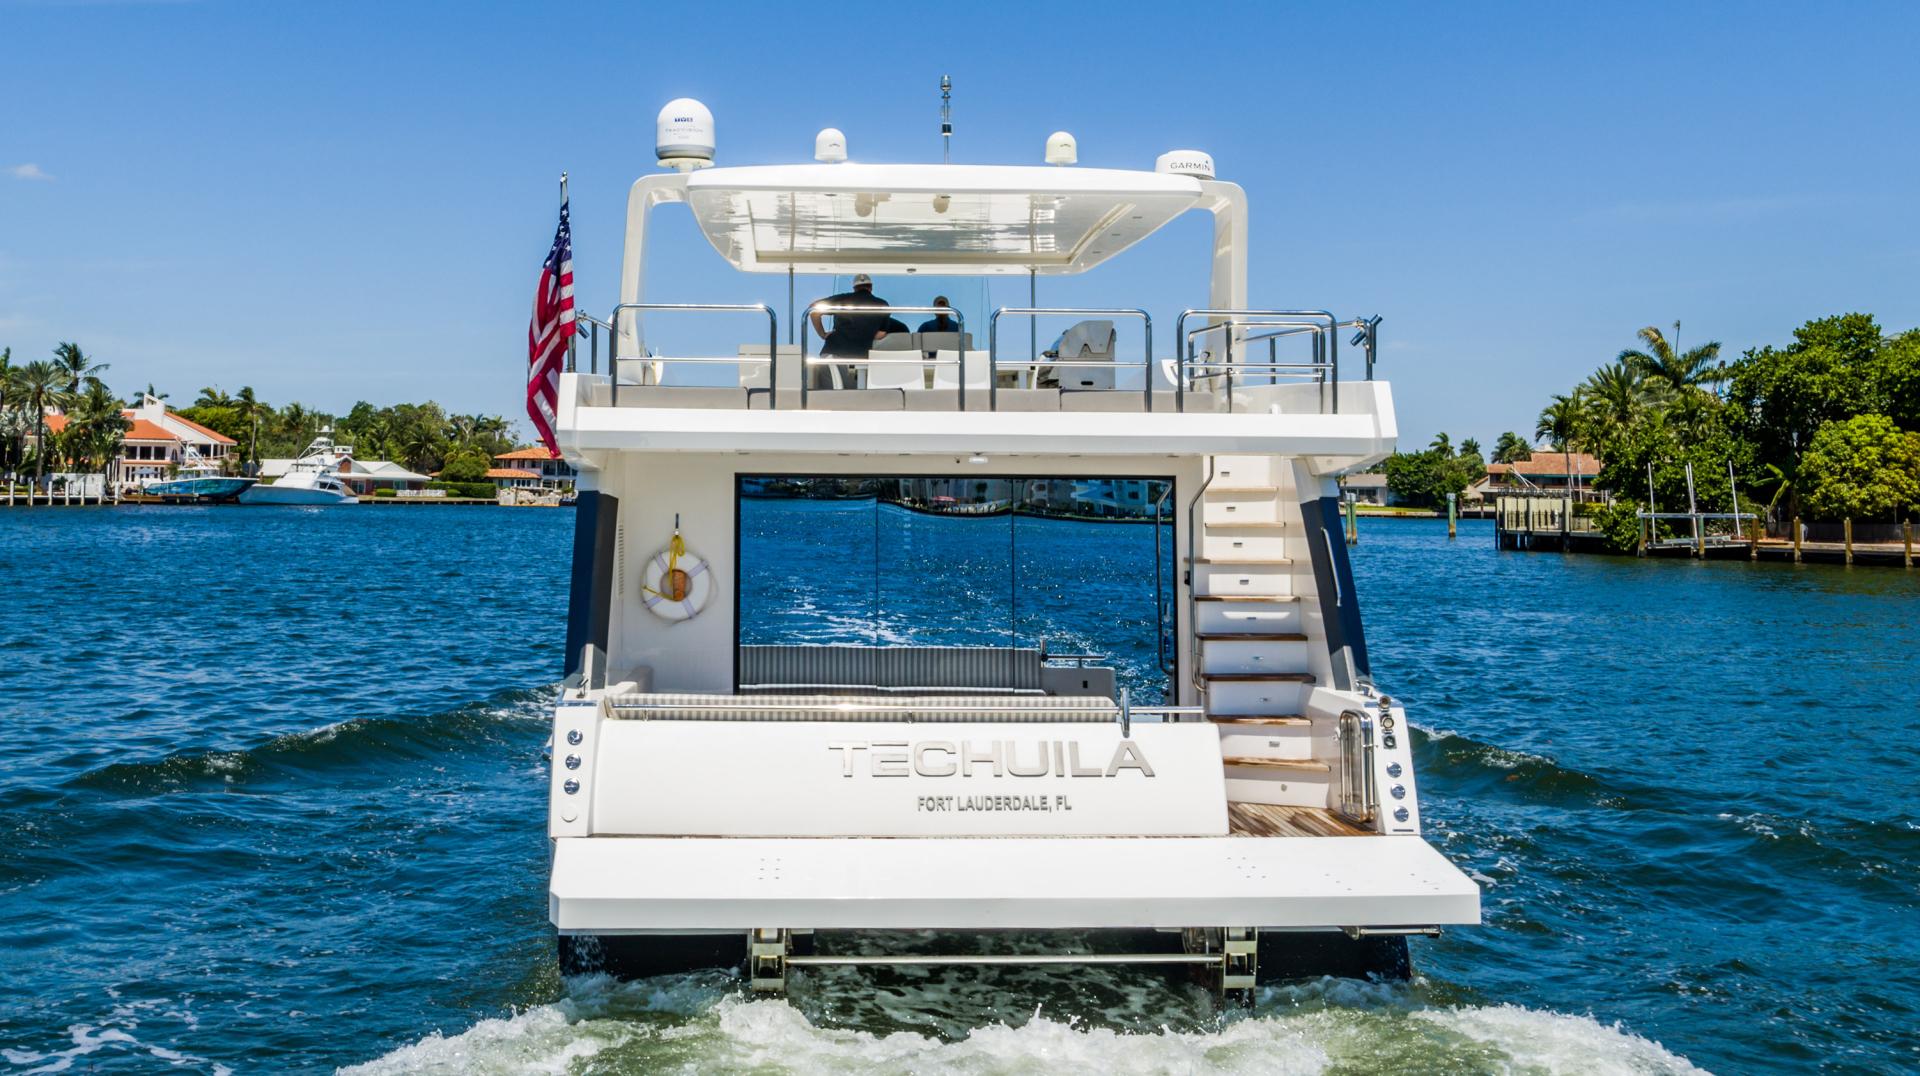 Overblue-58 Power Catamaran 2017-Techuila Ft. Lauderdale-Florida-United States-2017 Overblue 58 Powercat-1401109   Thumbnail